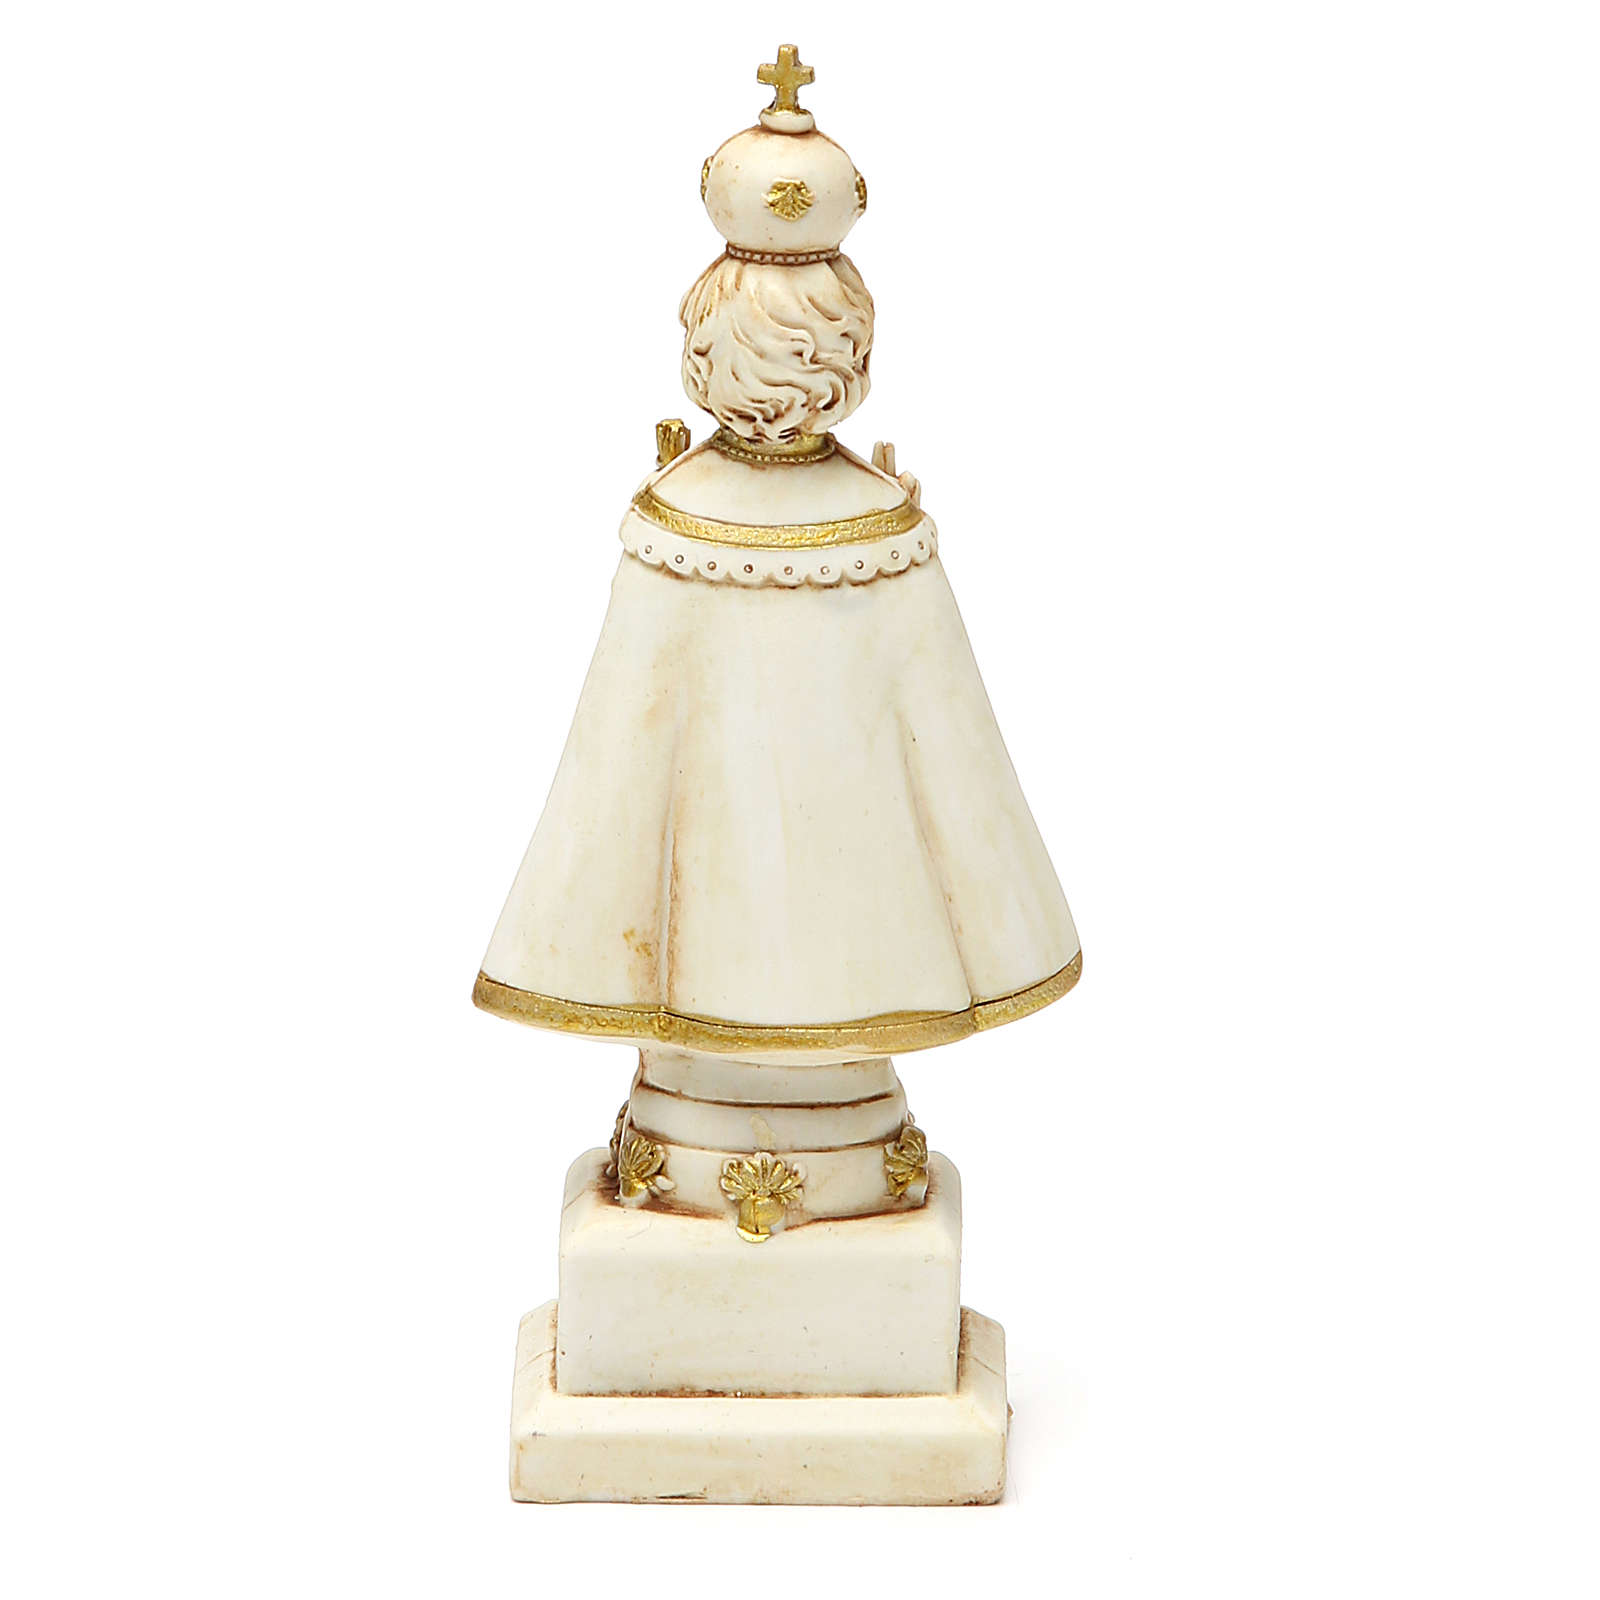 STOCK Gesù Bambino di Praga 15 cm gesso avorio 4